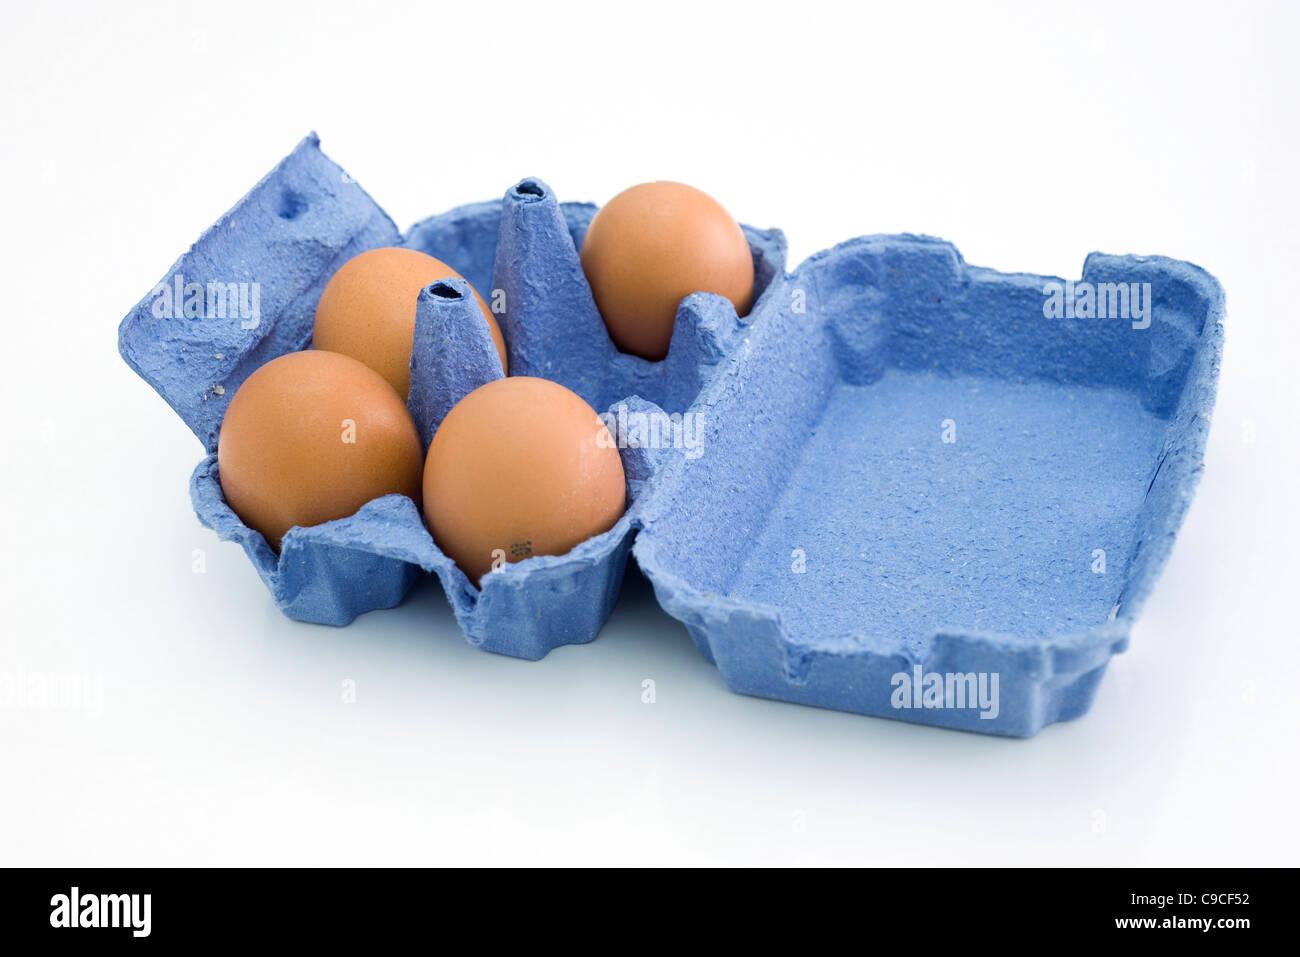 Fresh eggs in carton - Stock Image